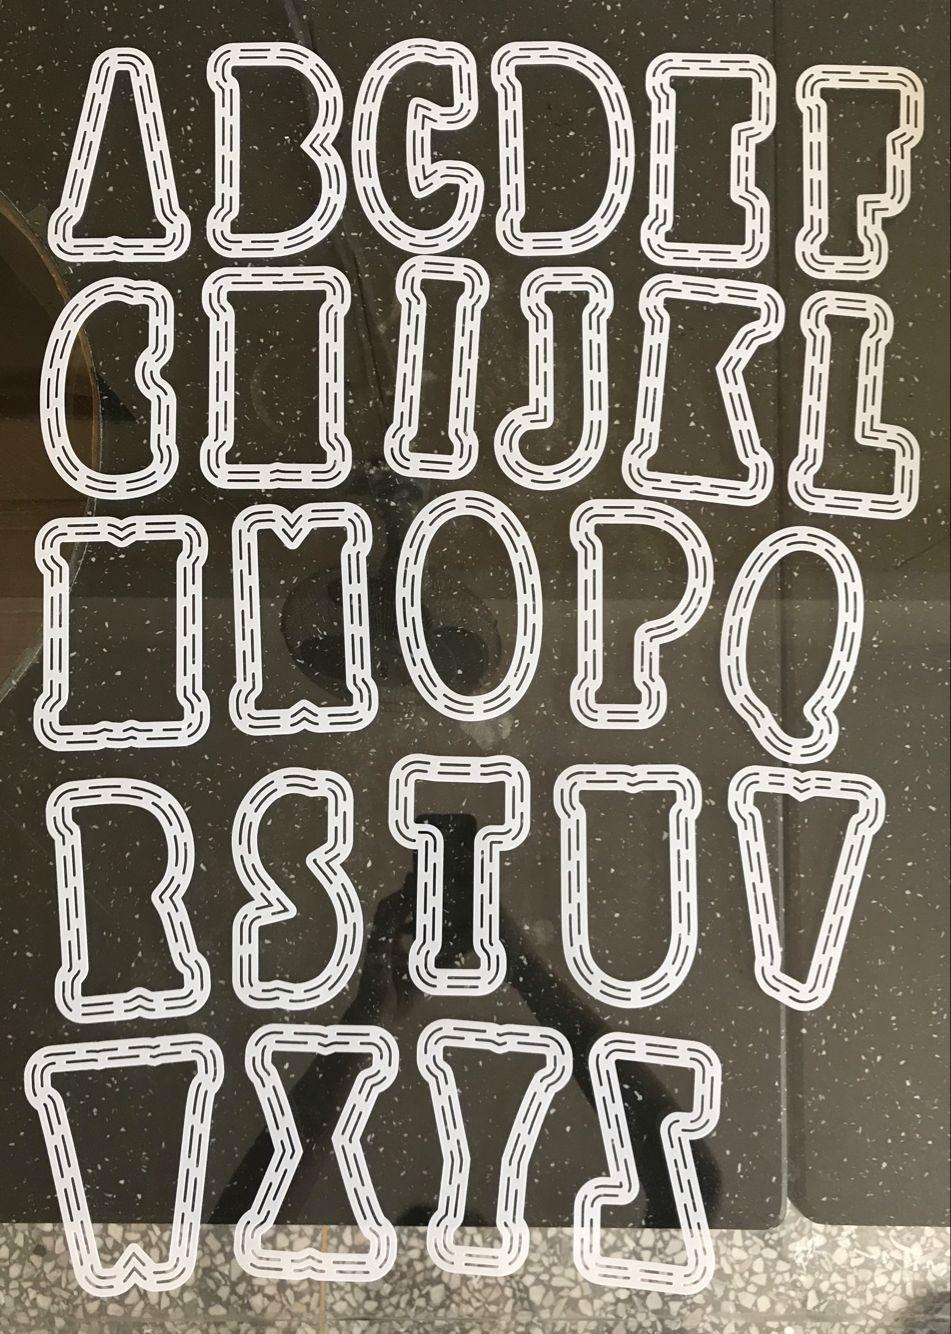 Large A-Z Alphabets 10cm Big Metal Cutting Dies&13cm Plastic Stencil for DIY Scrapbooking Crafts Paper Card Mkaing New 2019 Dies